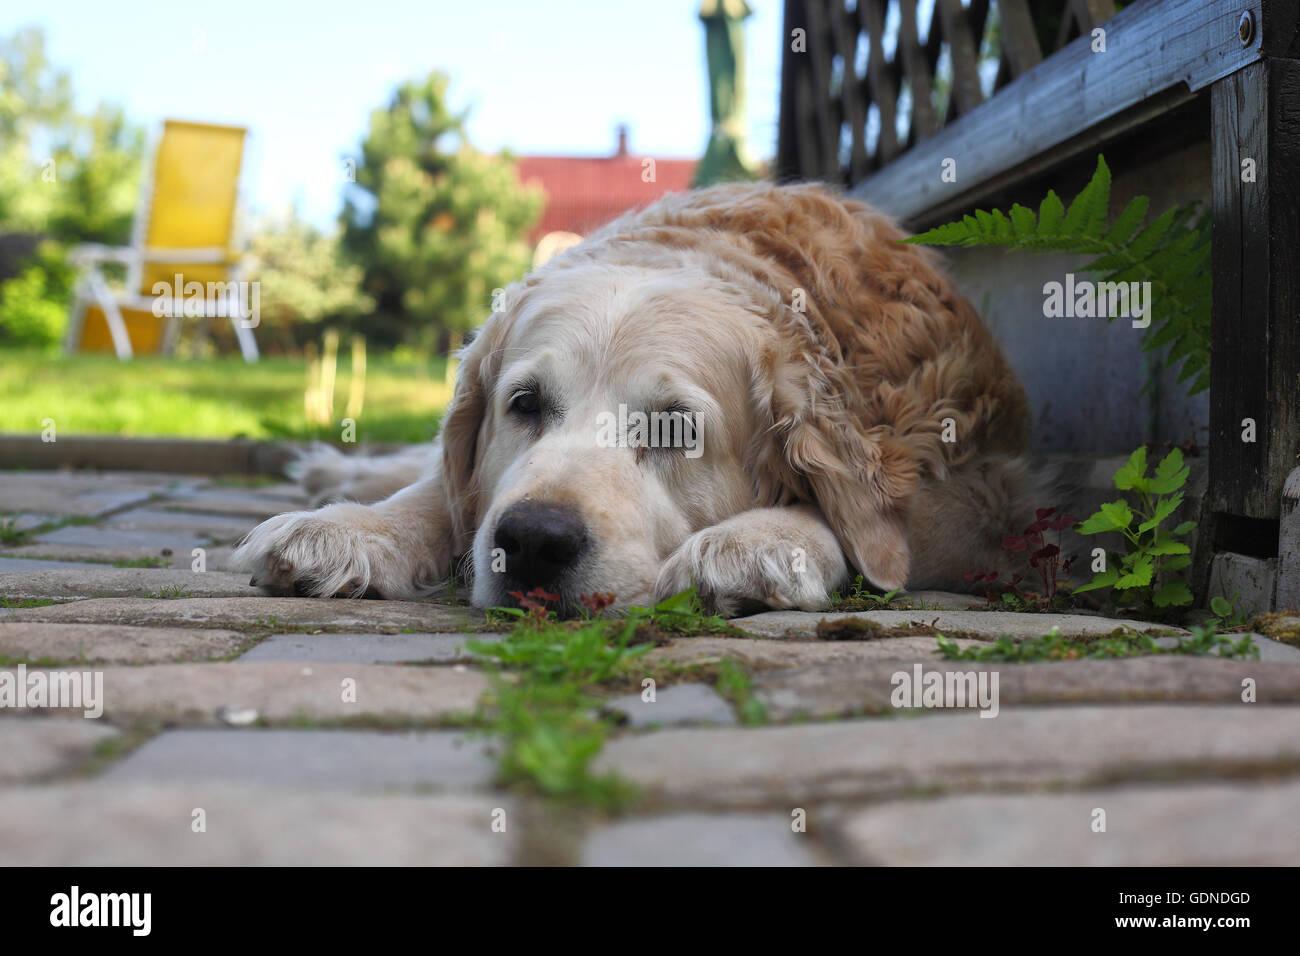 Sad big dog waiting for return of the owner. - Stock Image